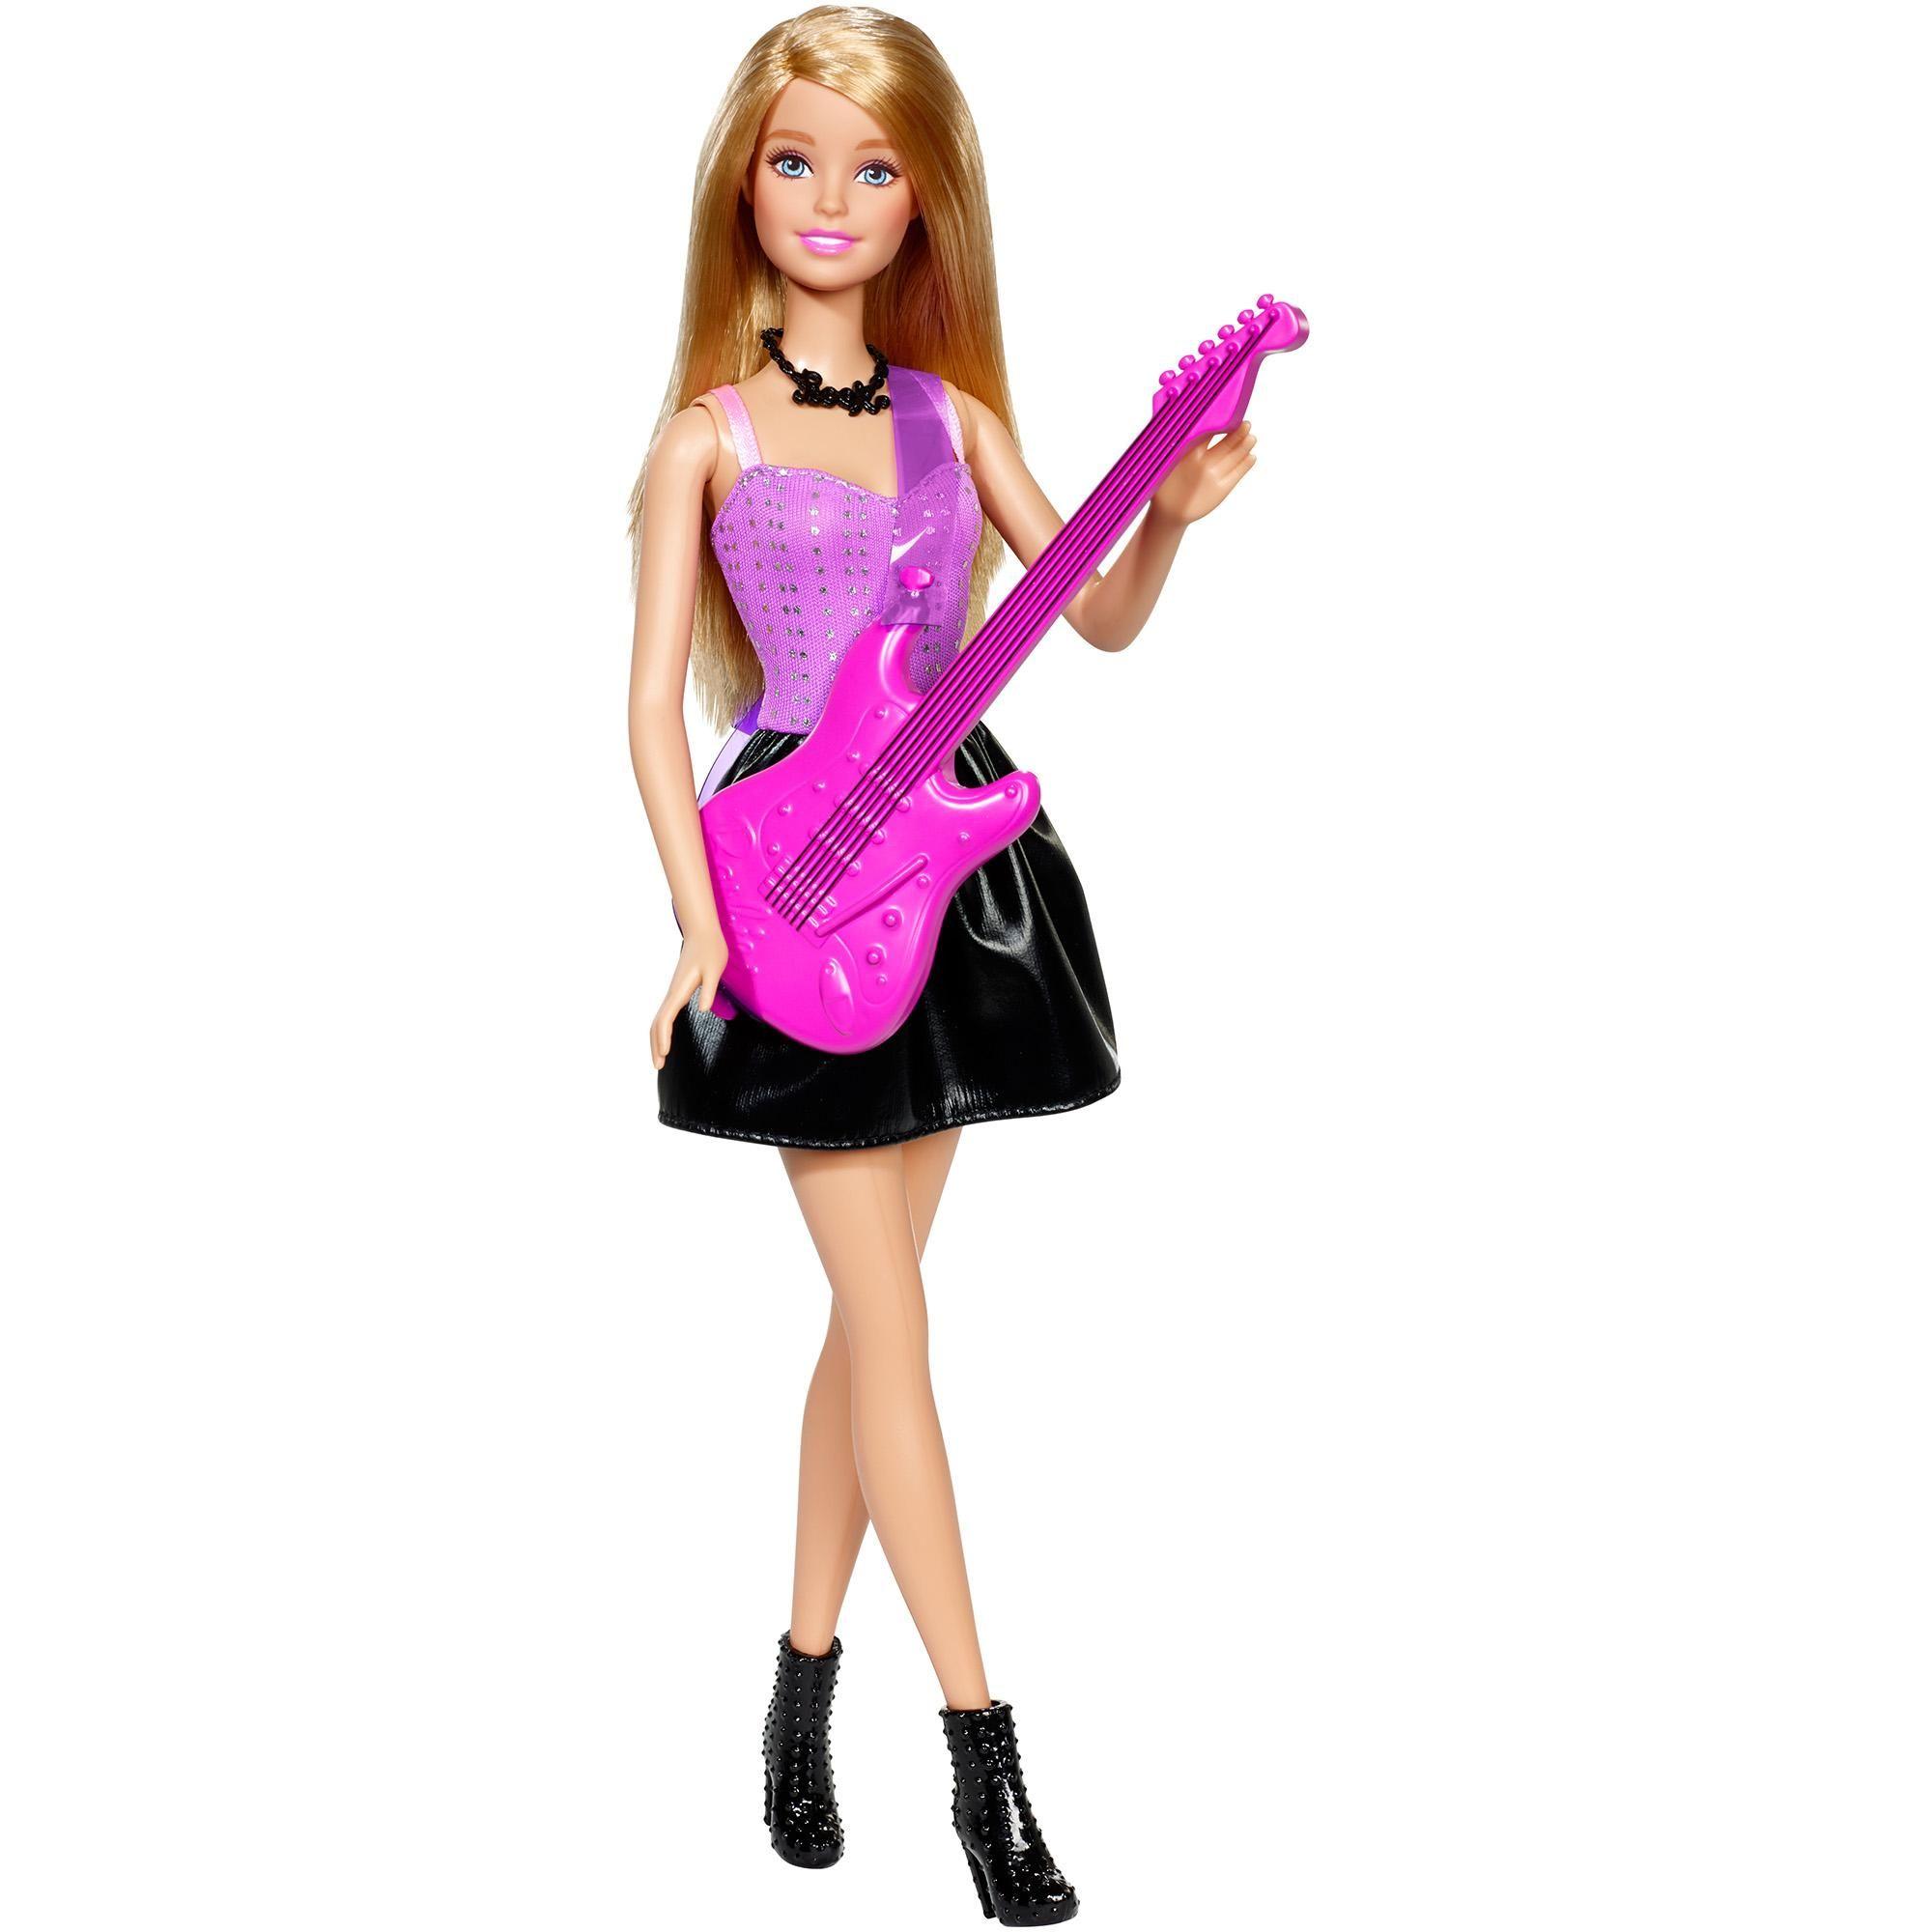 Barbie Rock N Royals Wallpaper: Hamleys For Barbie Rock